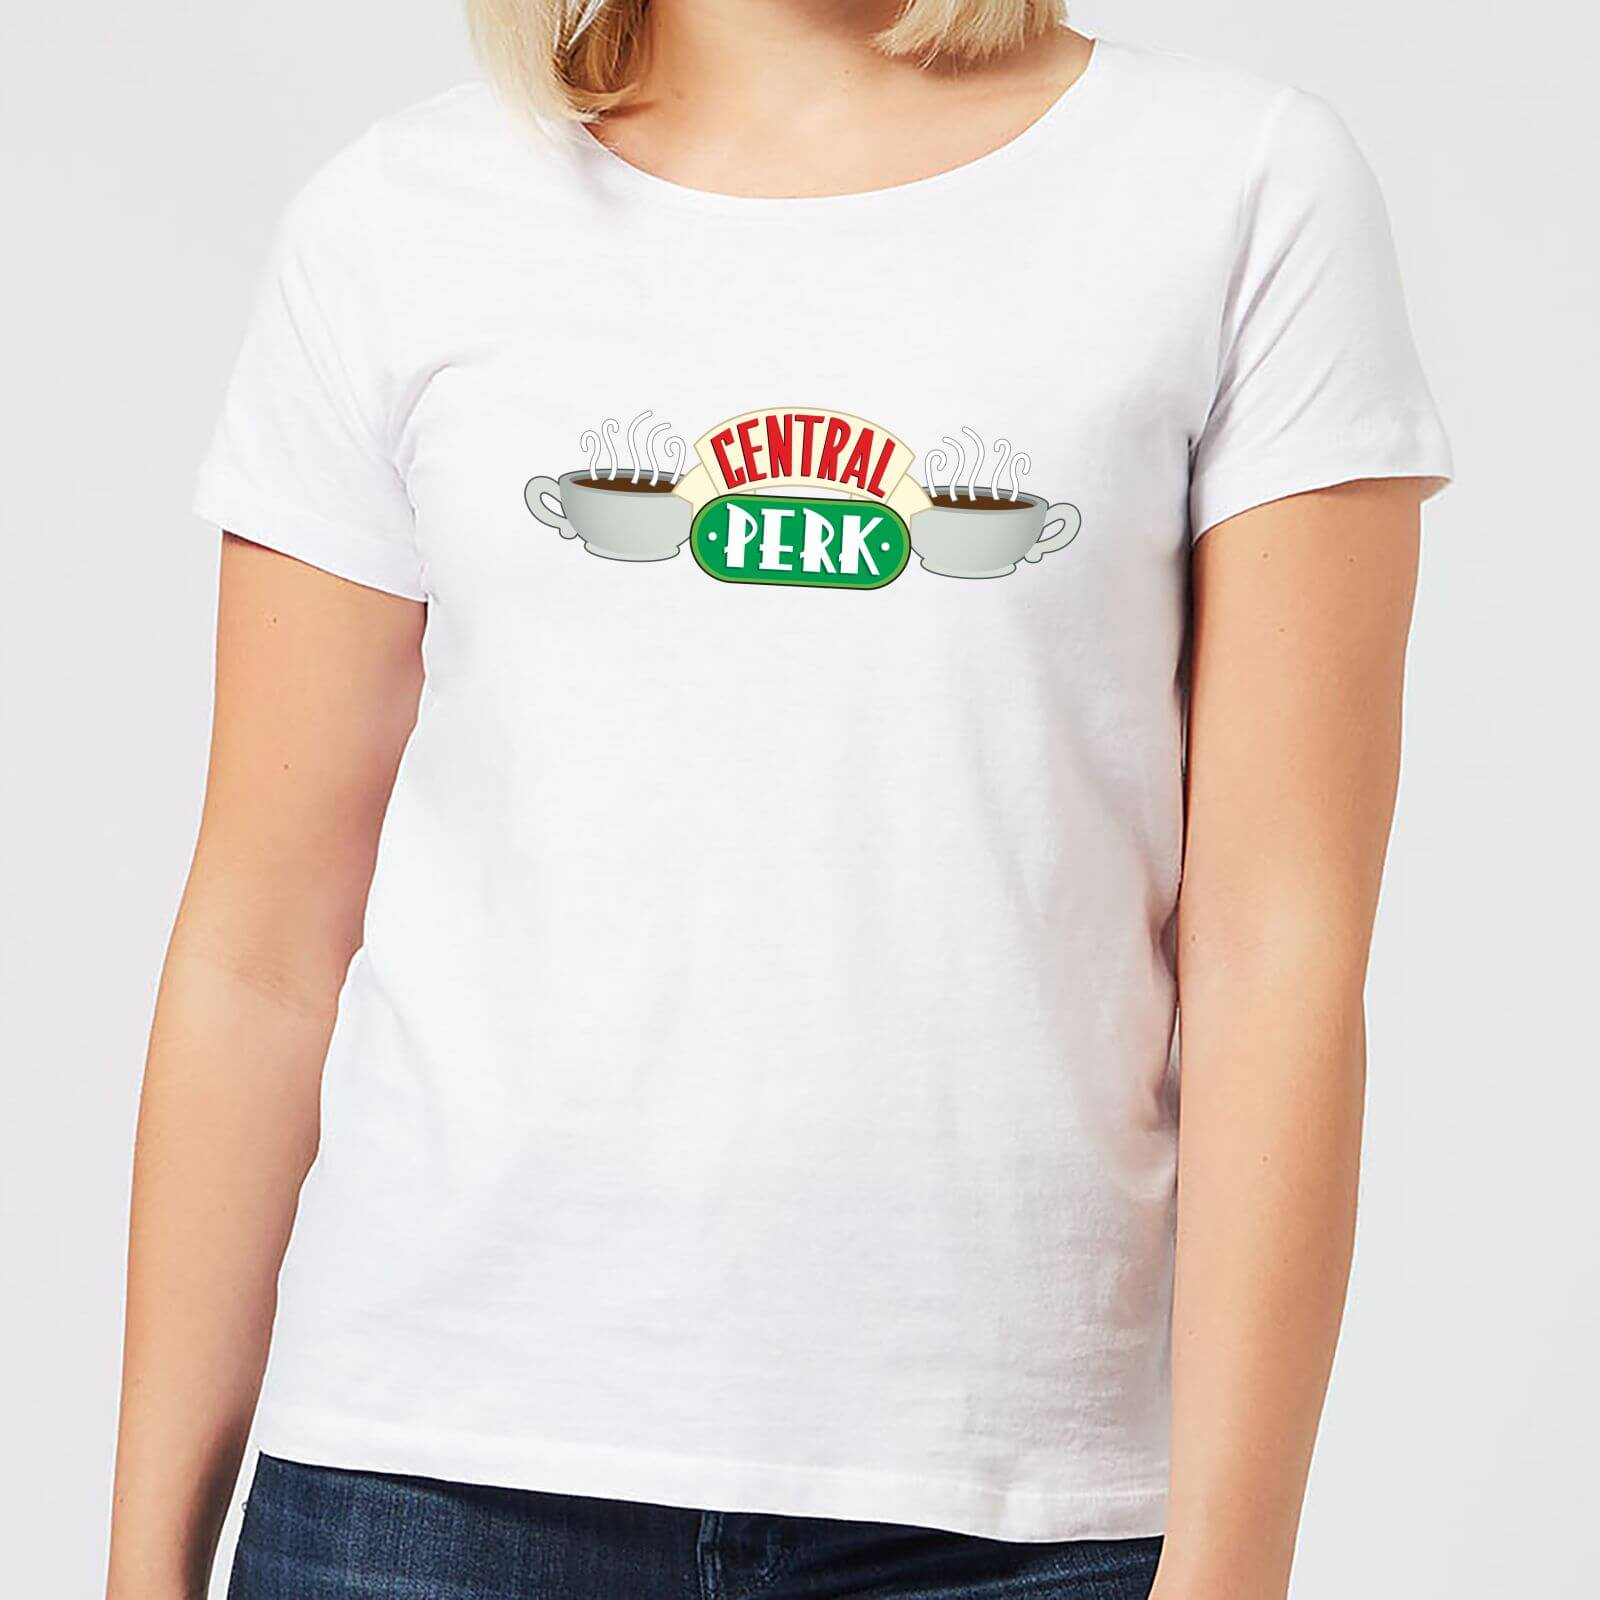 30bbdd460ab99 Friends Central Perk Women's T-Shirt - White Clothing | Zavvi